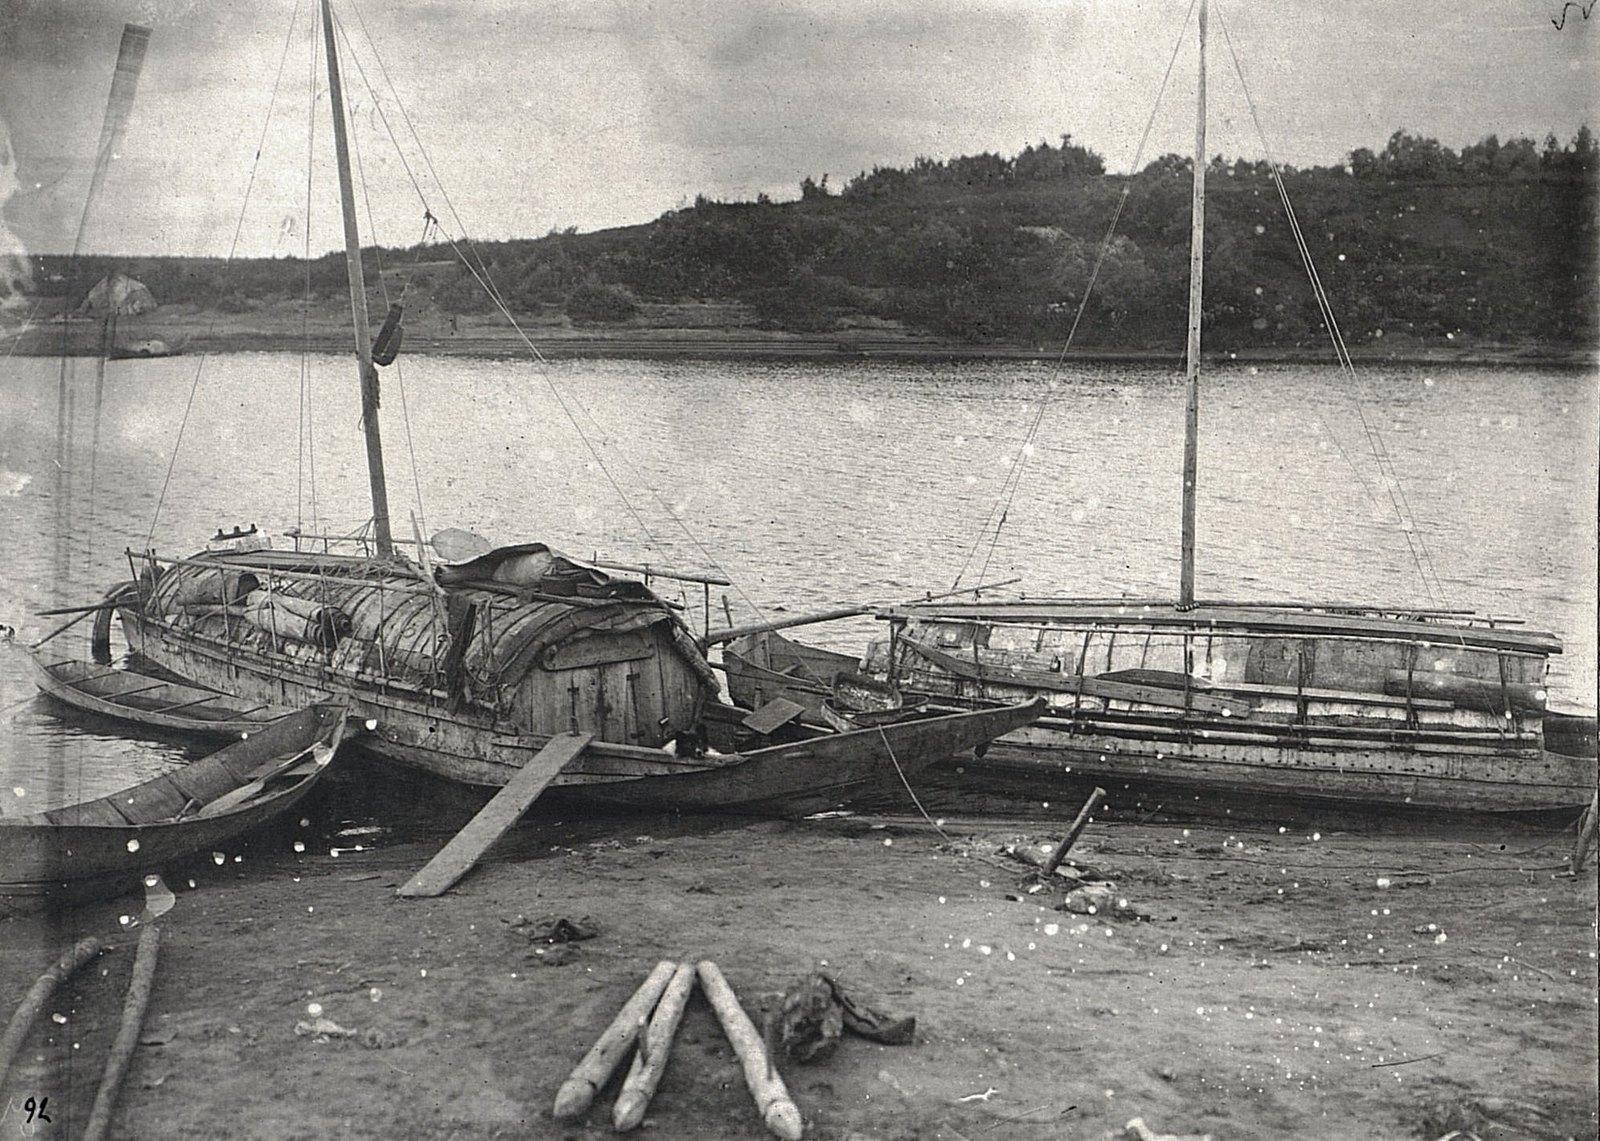 Вид на две крытые лодки